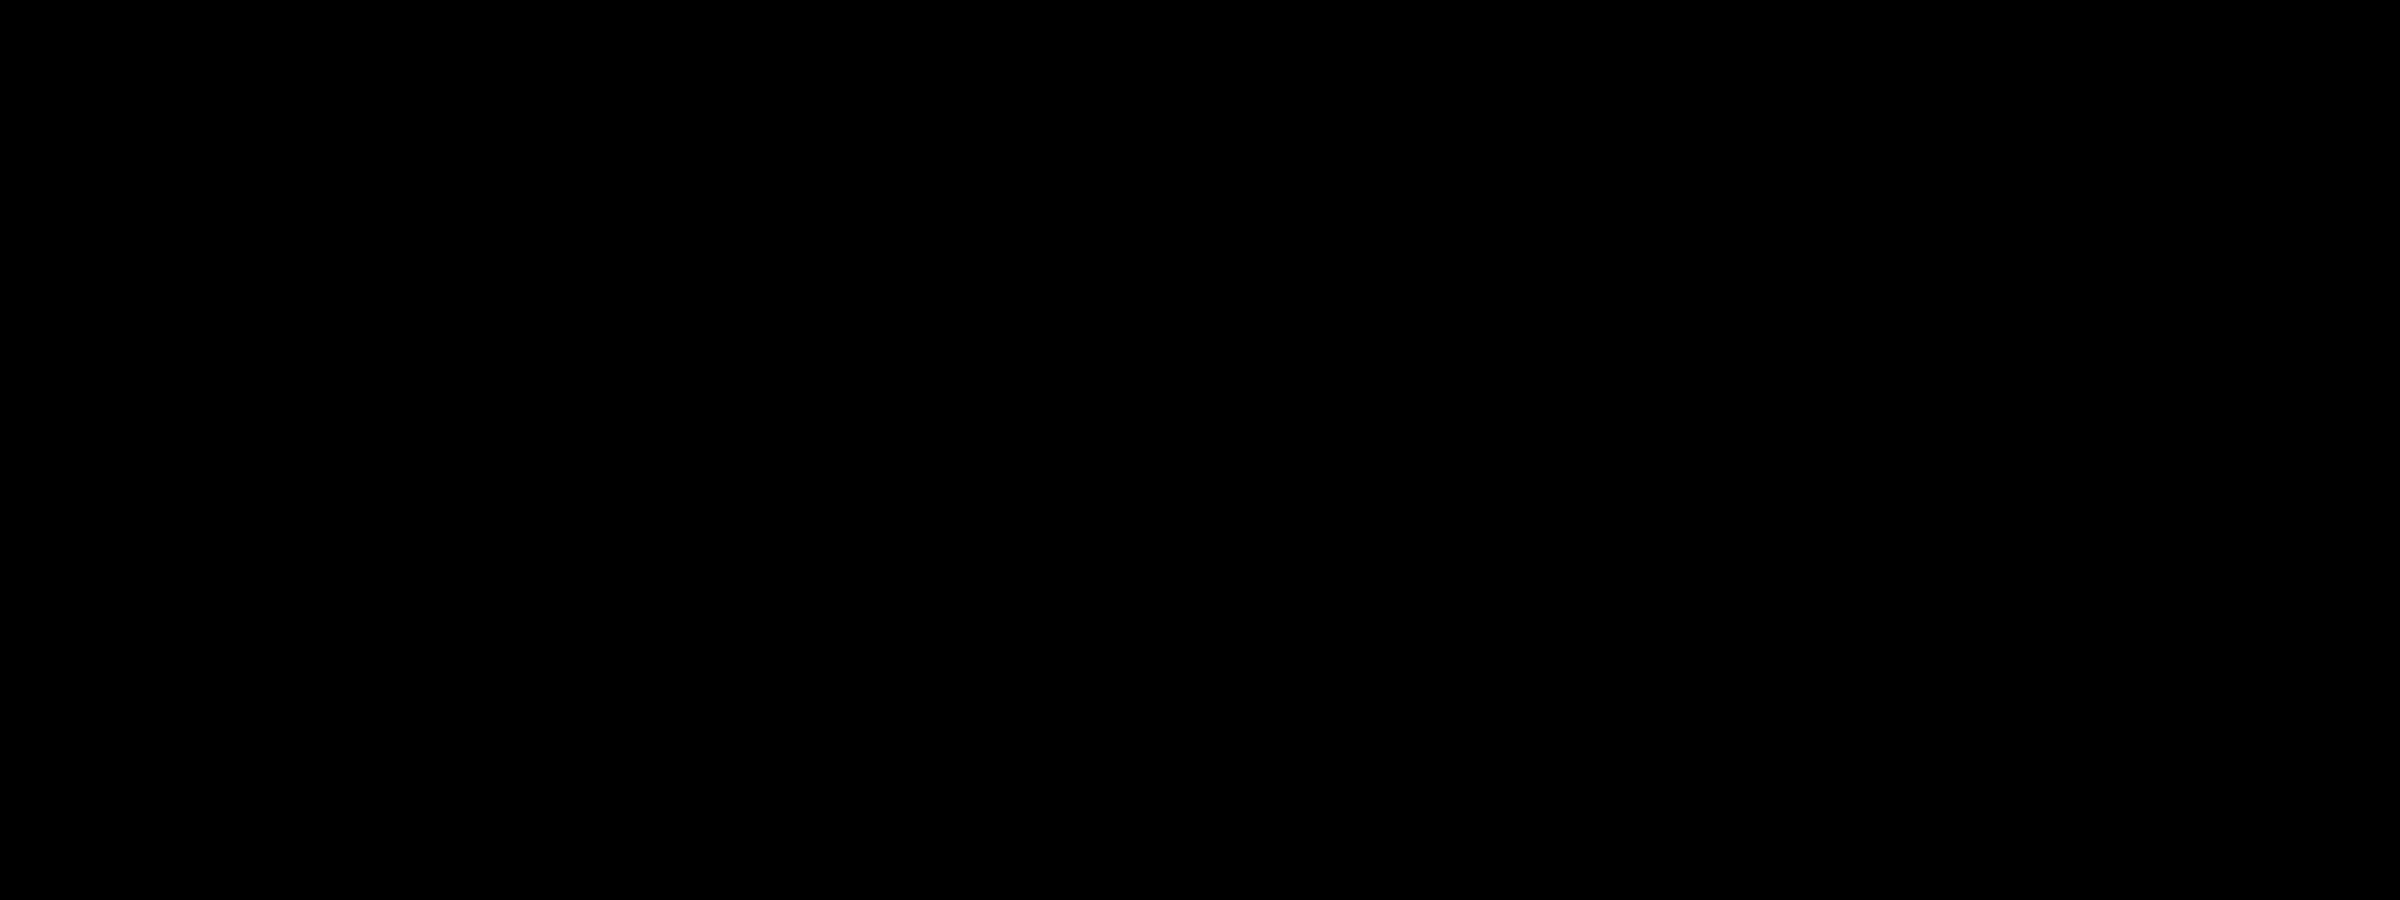 Logo ribbon clipart png graphic transparent download BLANK RIBBON PNG - ClipArt Best graphic transparent download